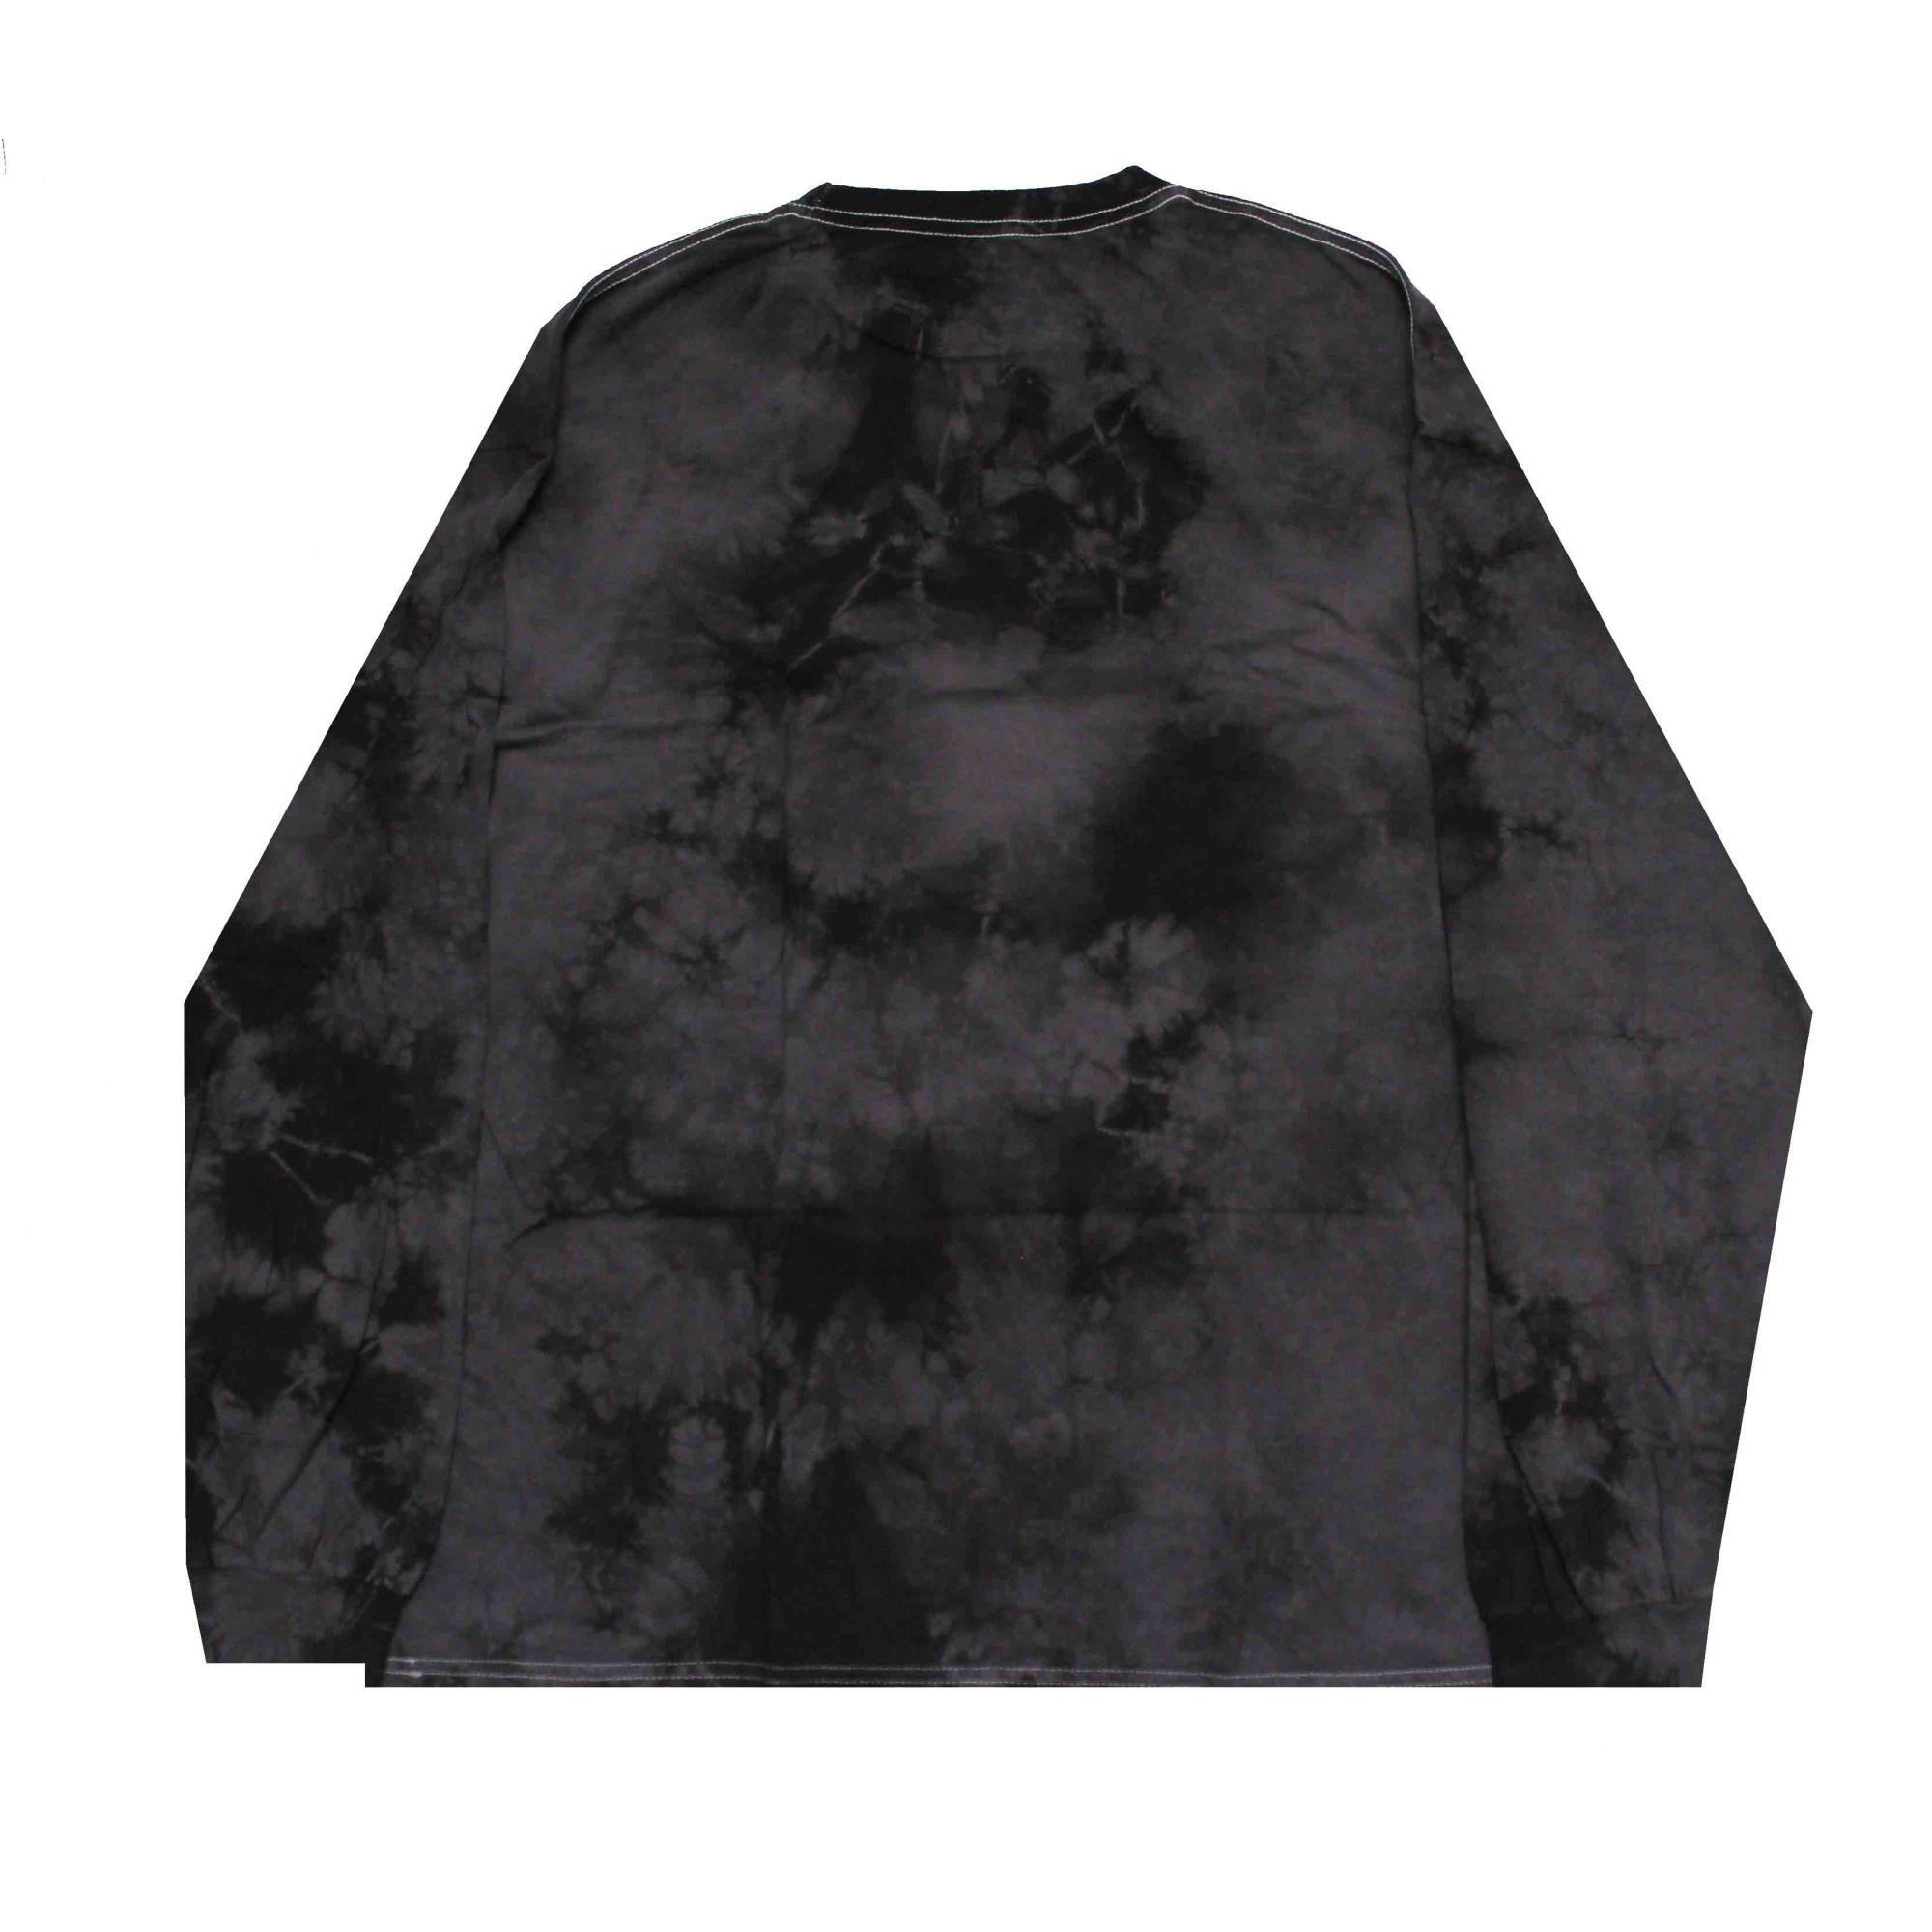 Camiseta Manga Longa Primitive Nuevo Cristal Wash Tie Dye Black